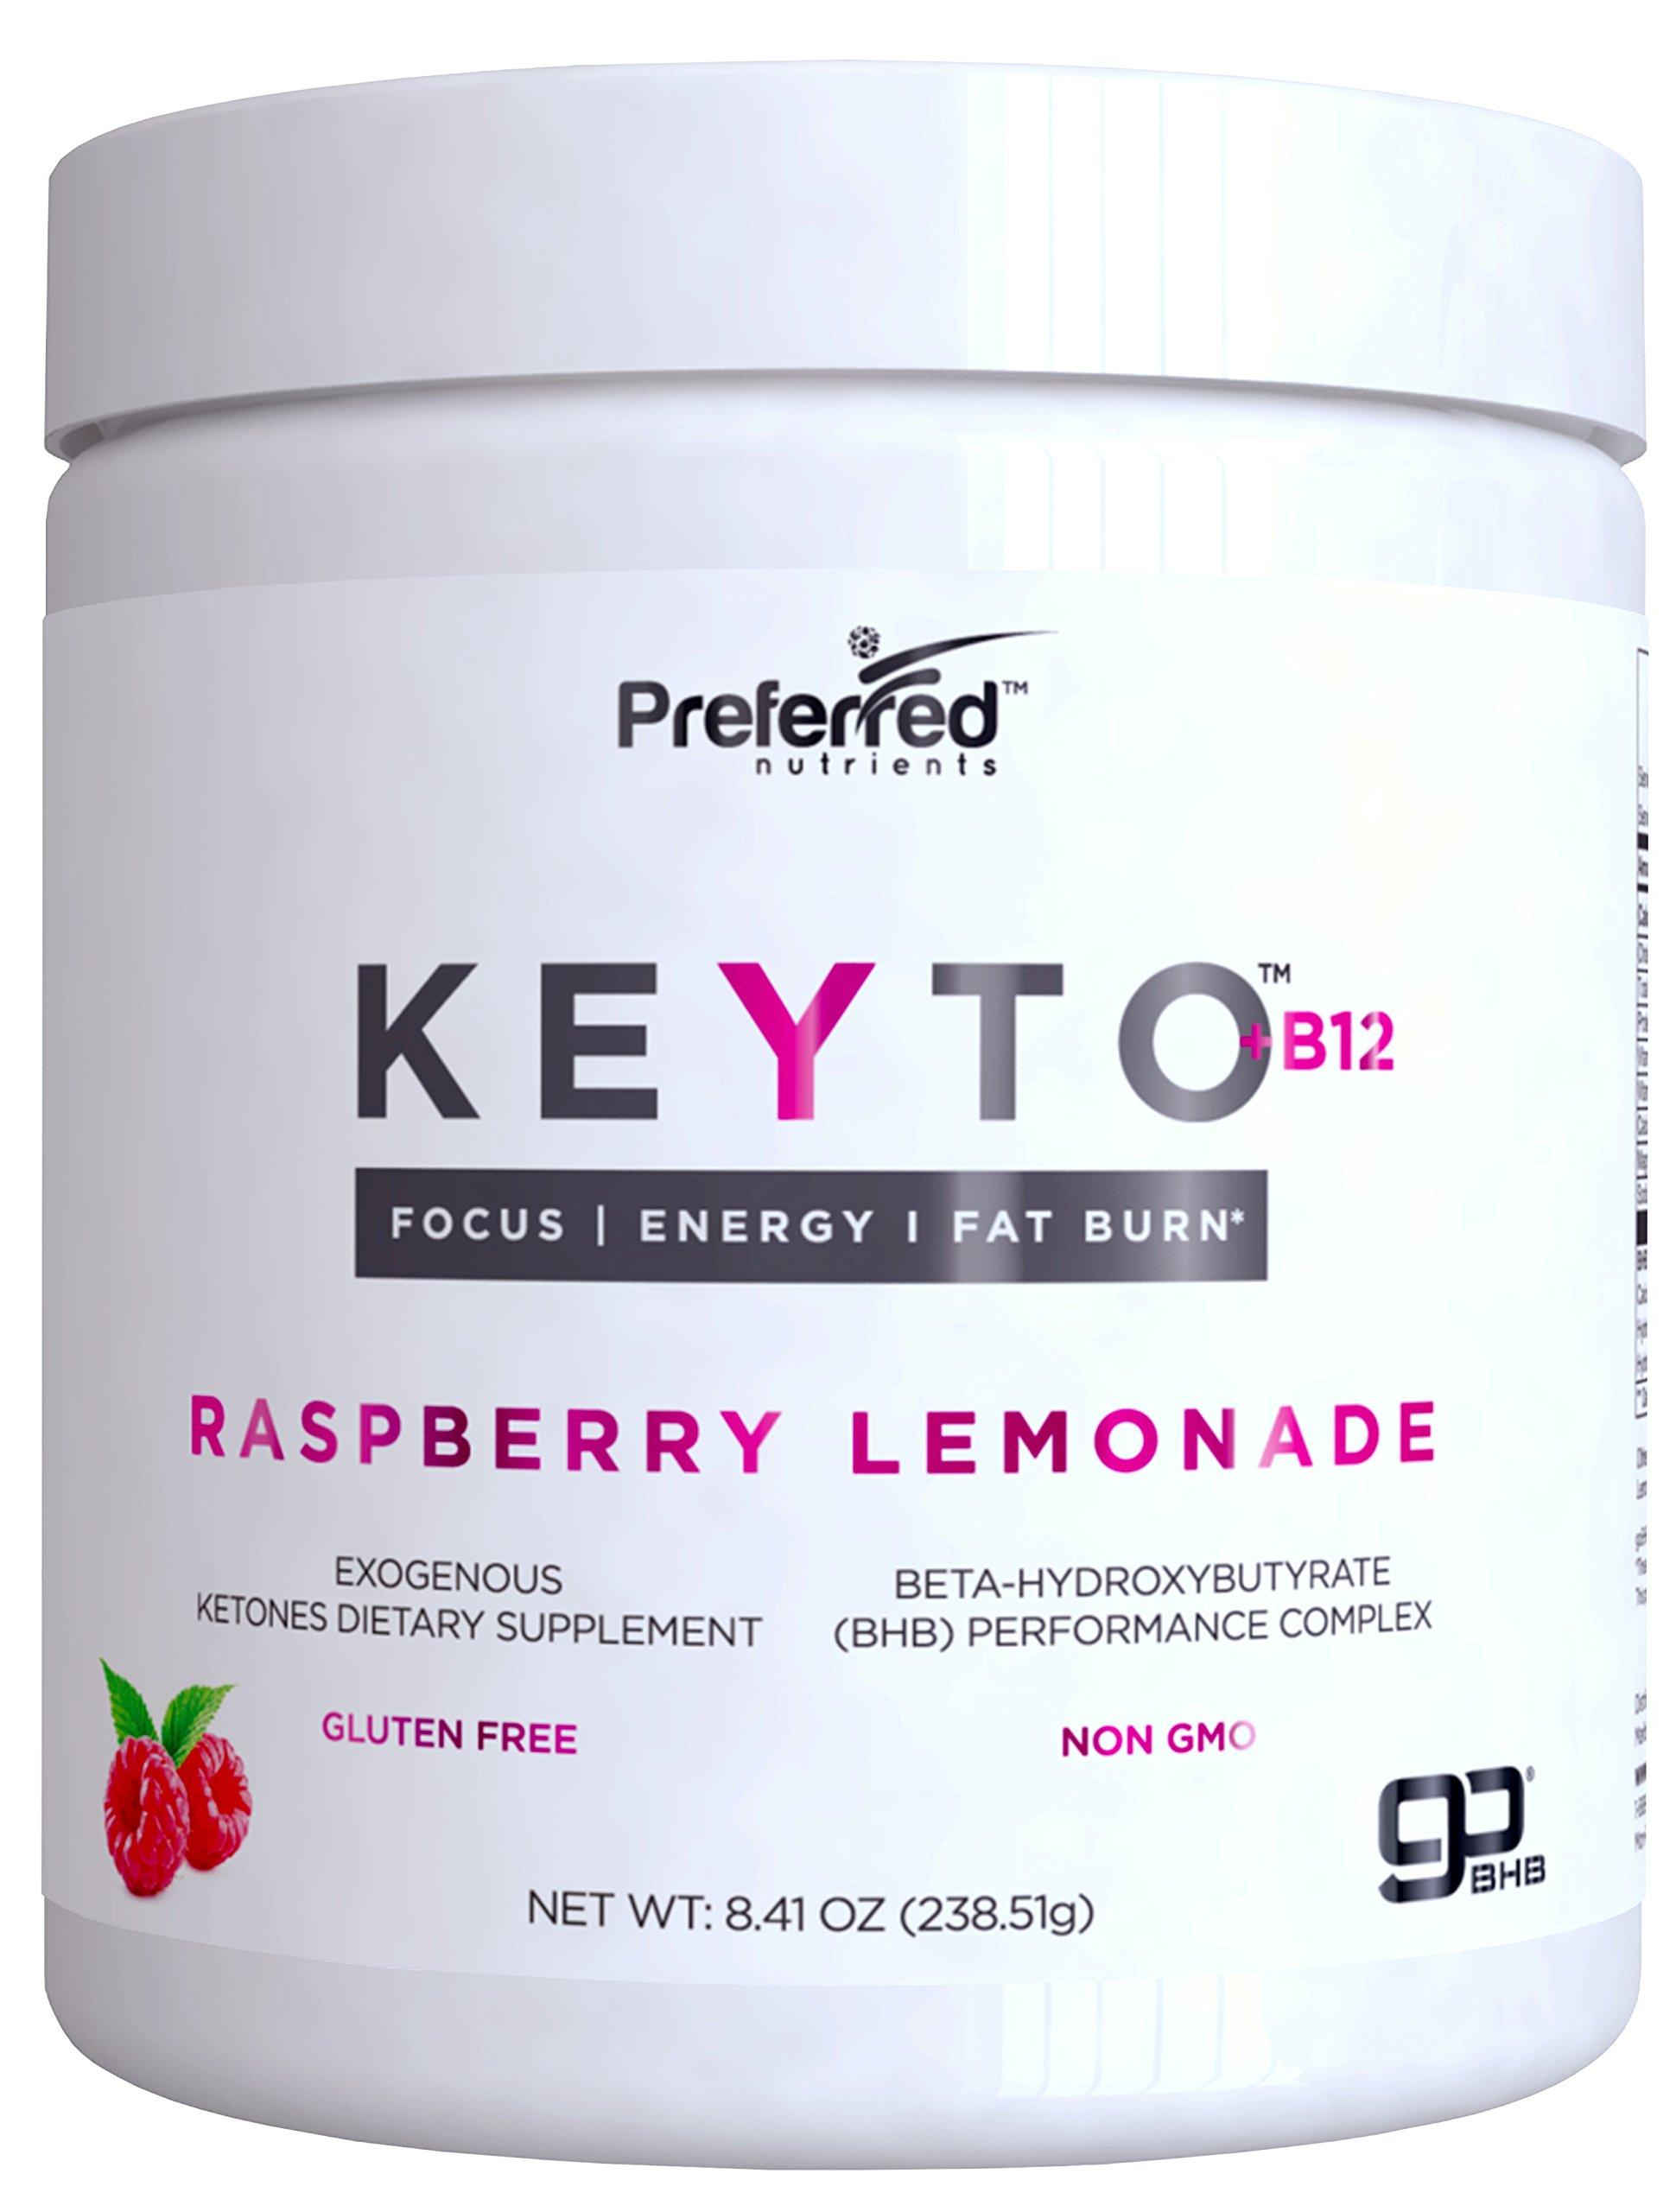 Amazon.com: Keto BHB Salts Exogenous Ketones - Beta-Hydroxybutyrate Supplement Powder & Vitamin ...